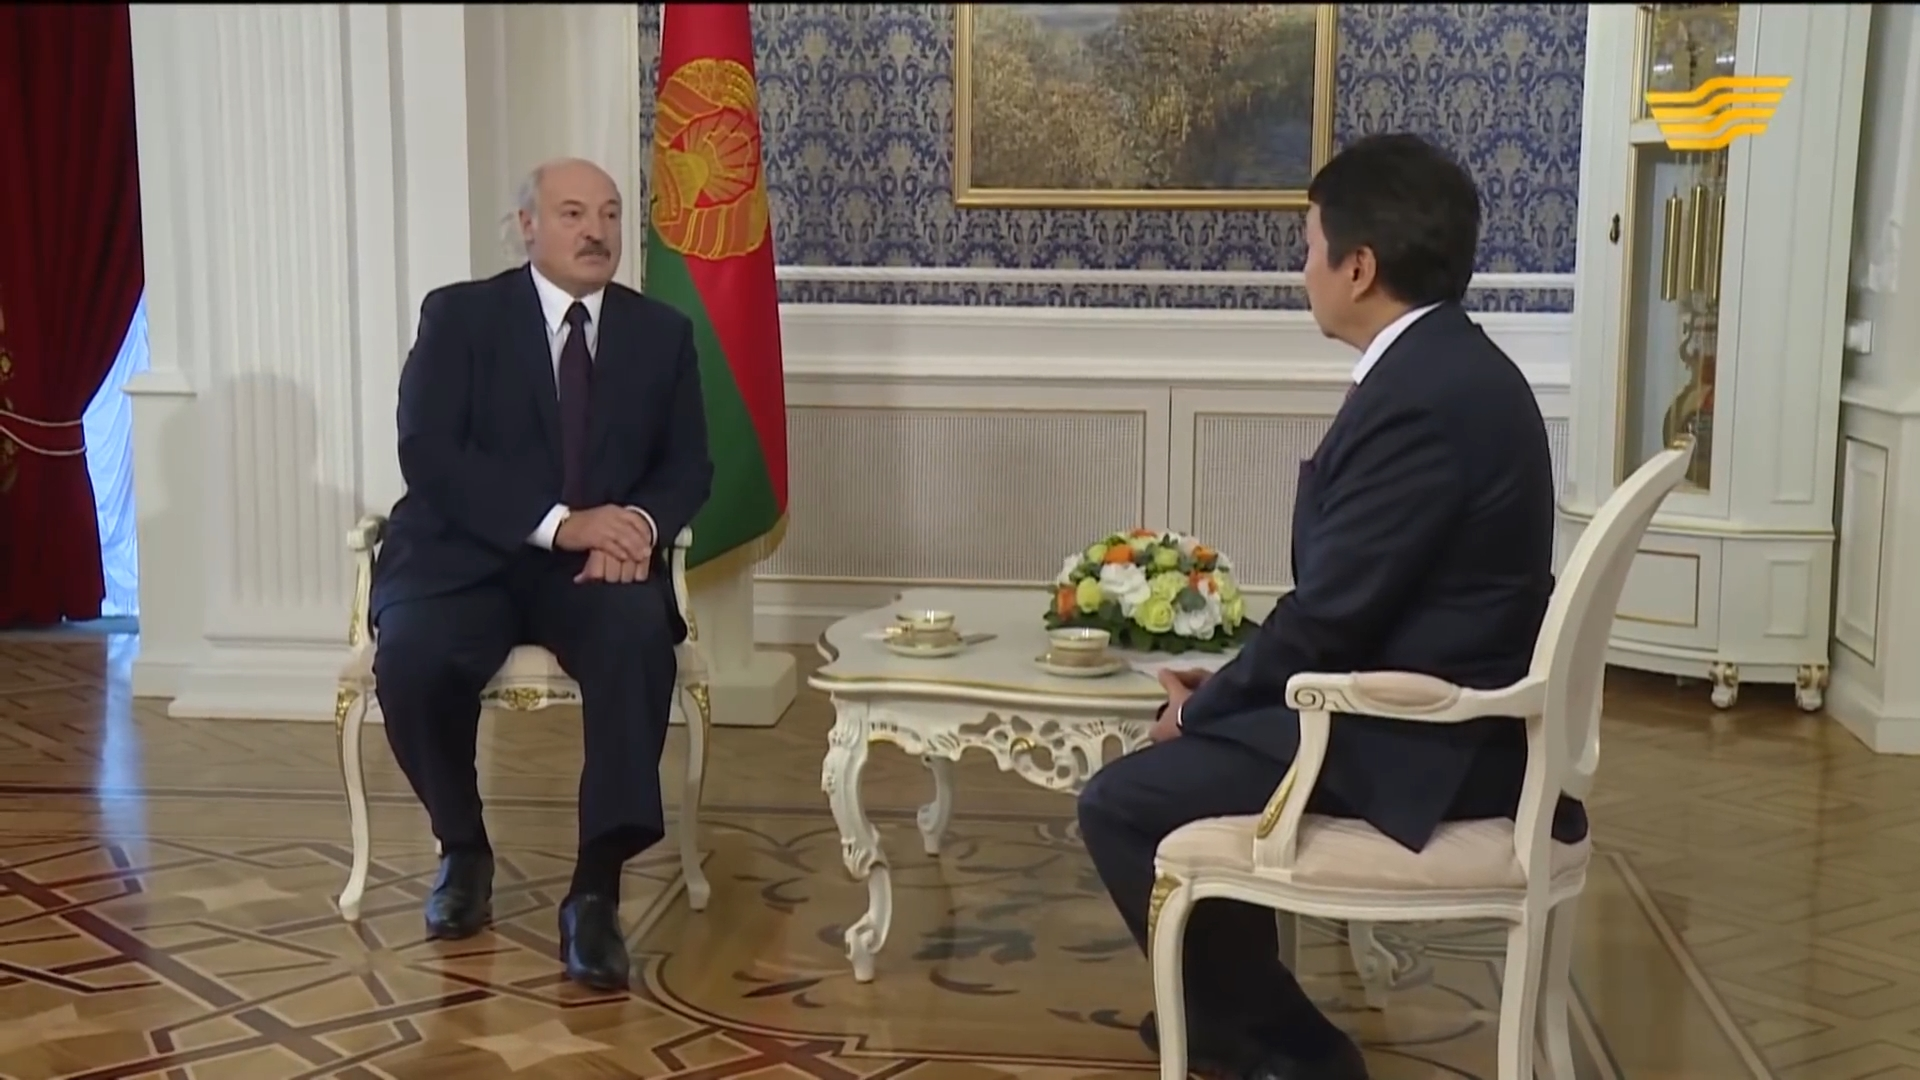 20191022_20-40-Александр Лукашенко дал эксклюзивное интервью телеканалу «Хабар»-scr13